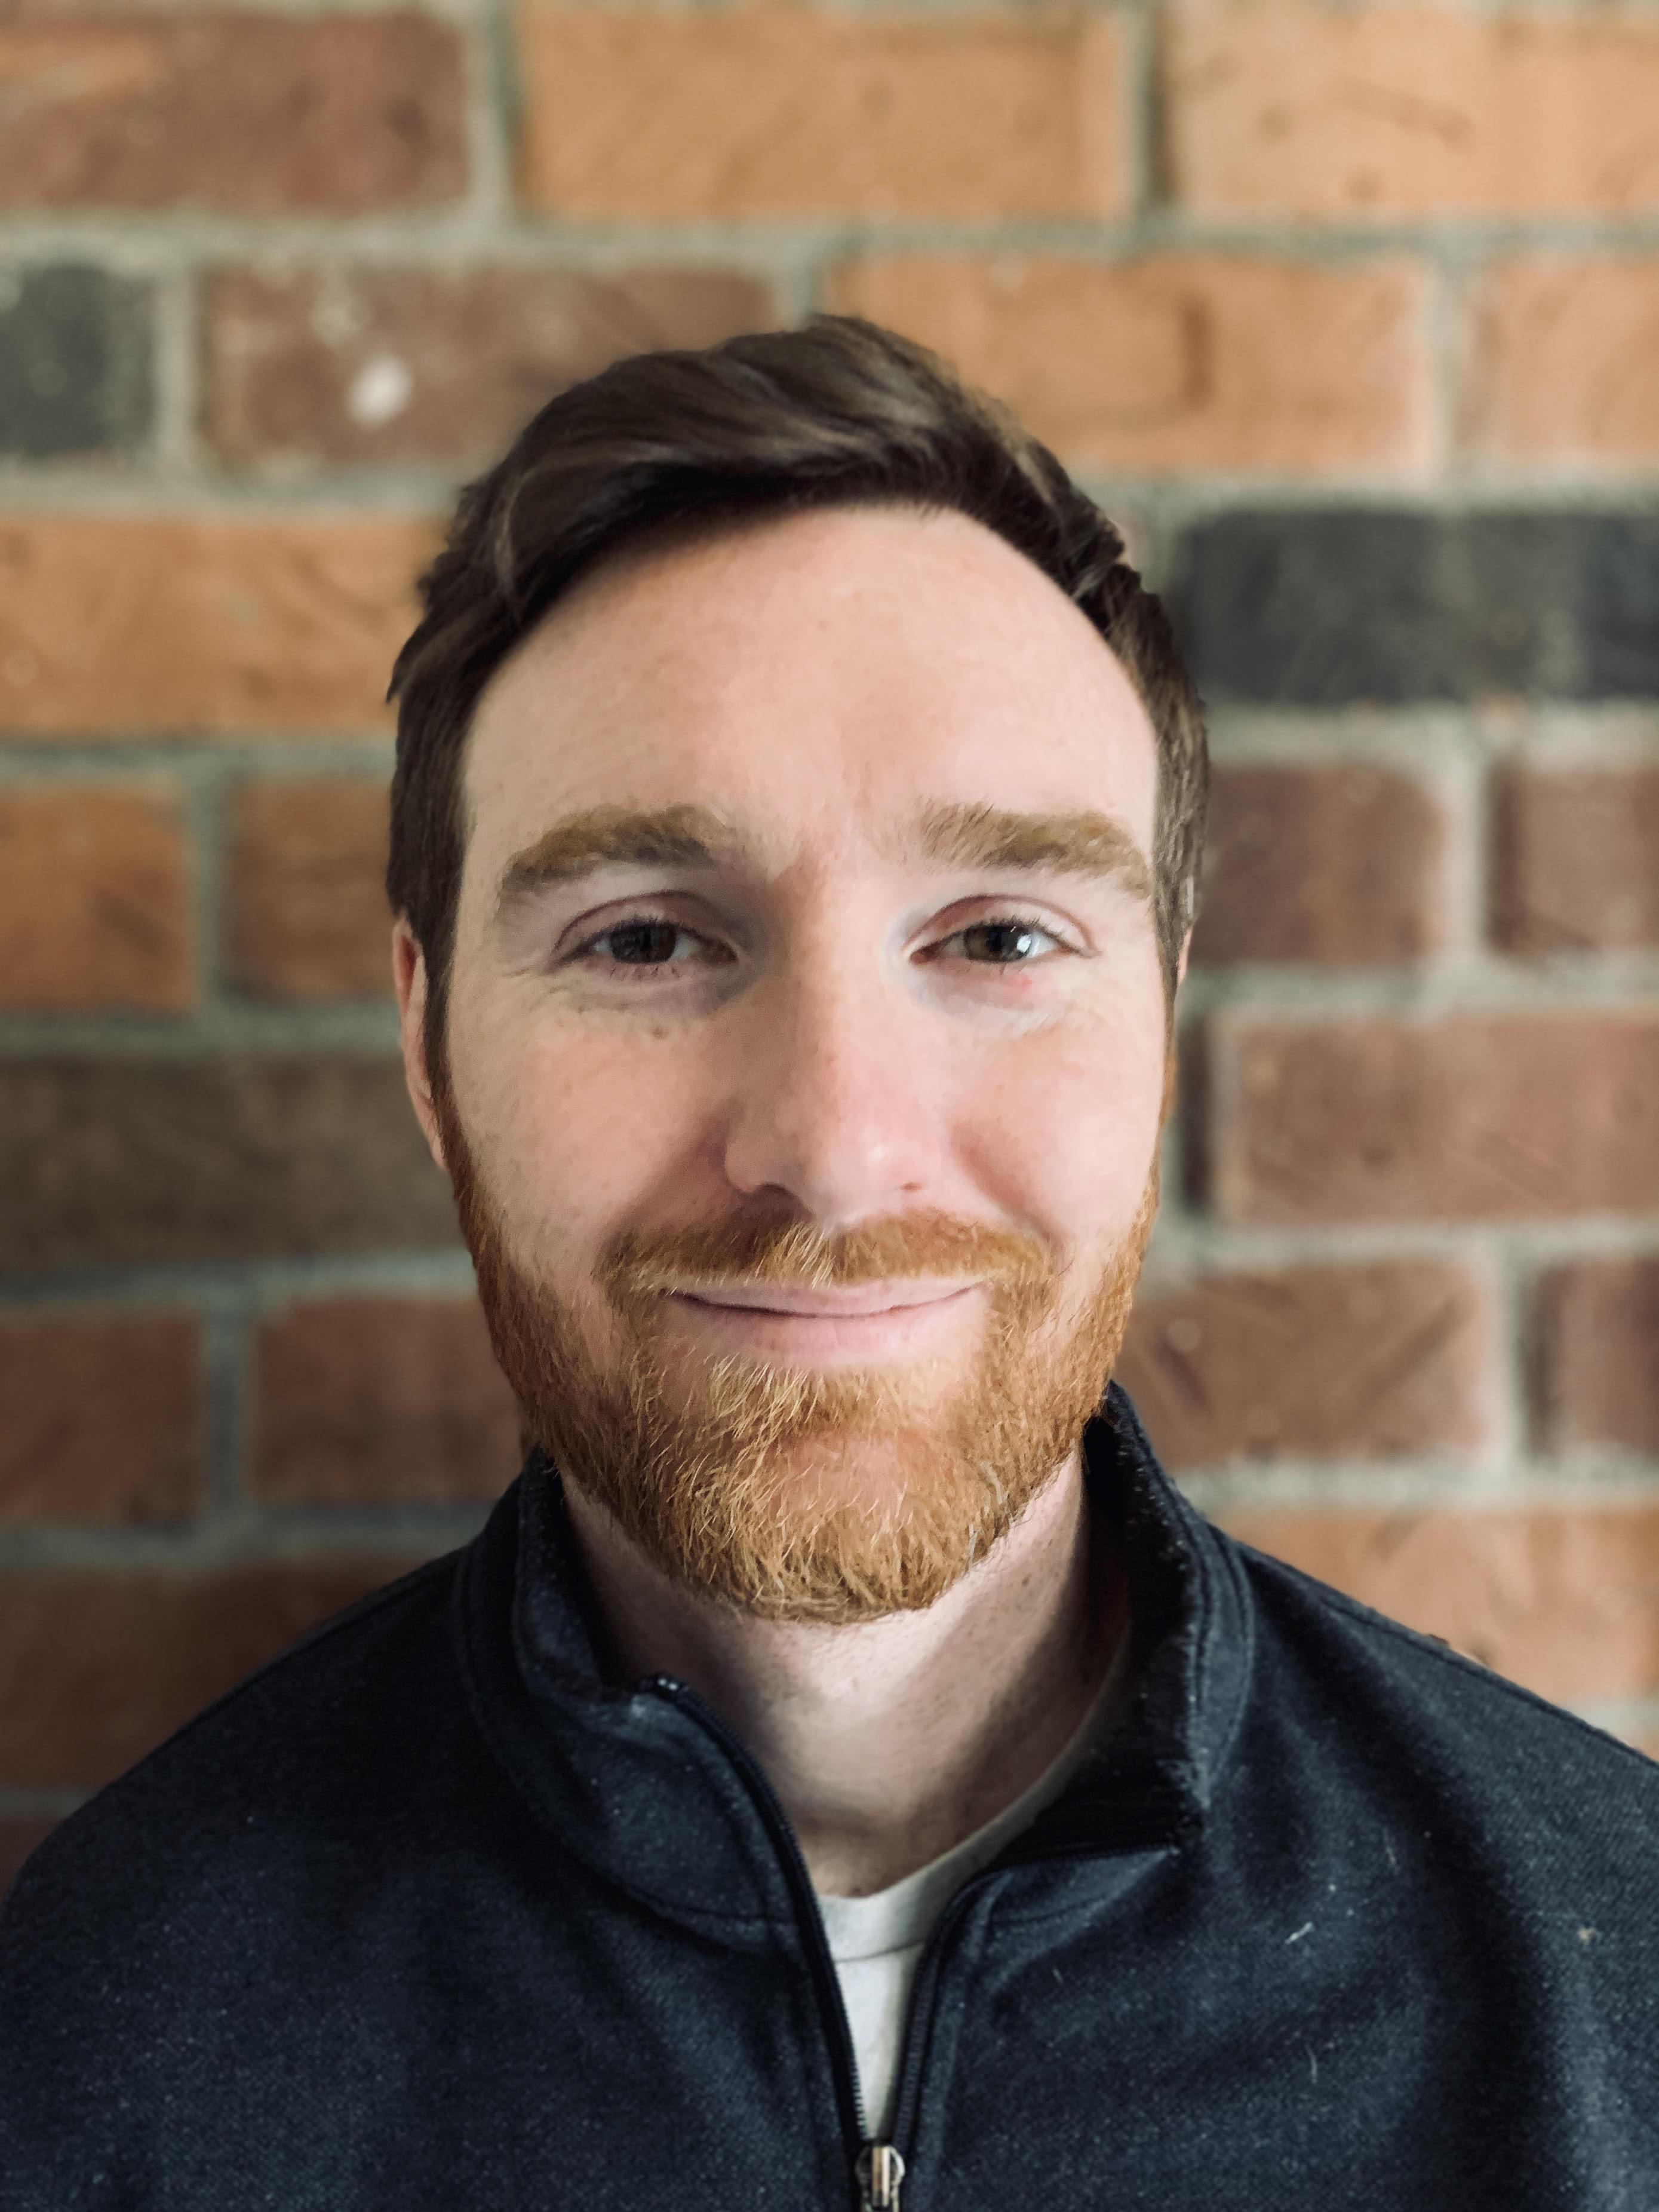 Keith Leonard. Upper School English Teacher at the Wellington School and 2020 WOSU Classroom Impact Award Winner